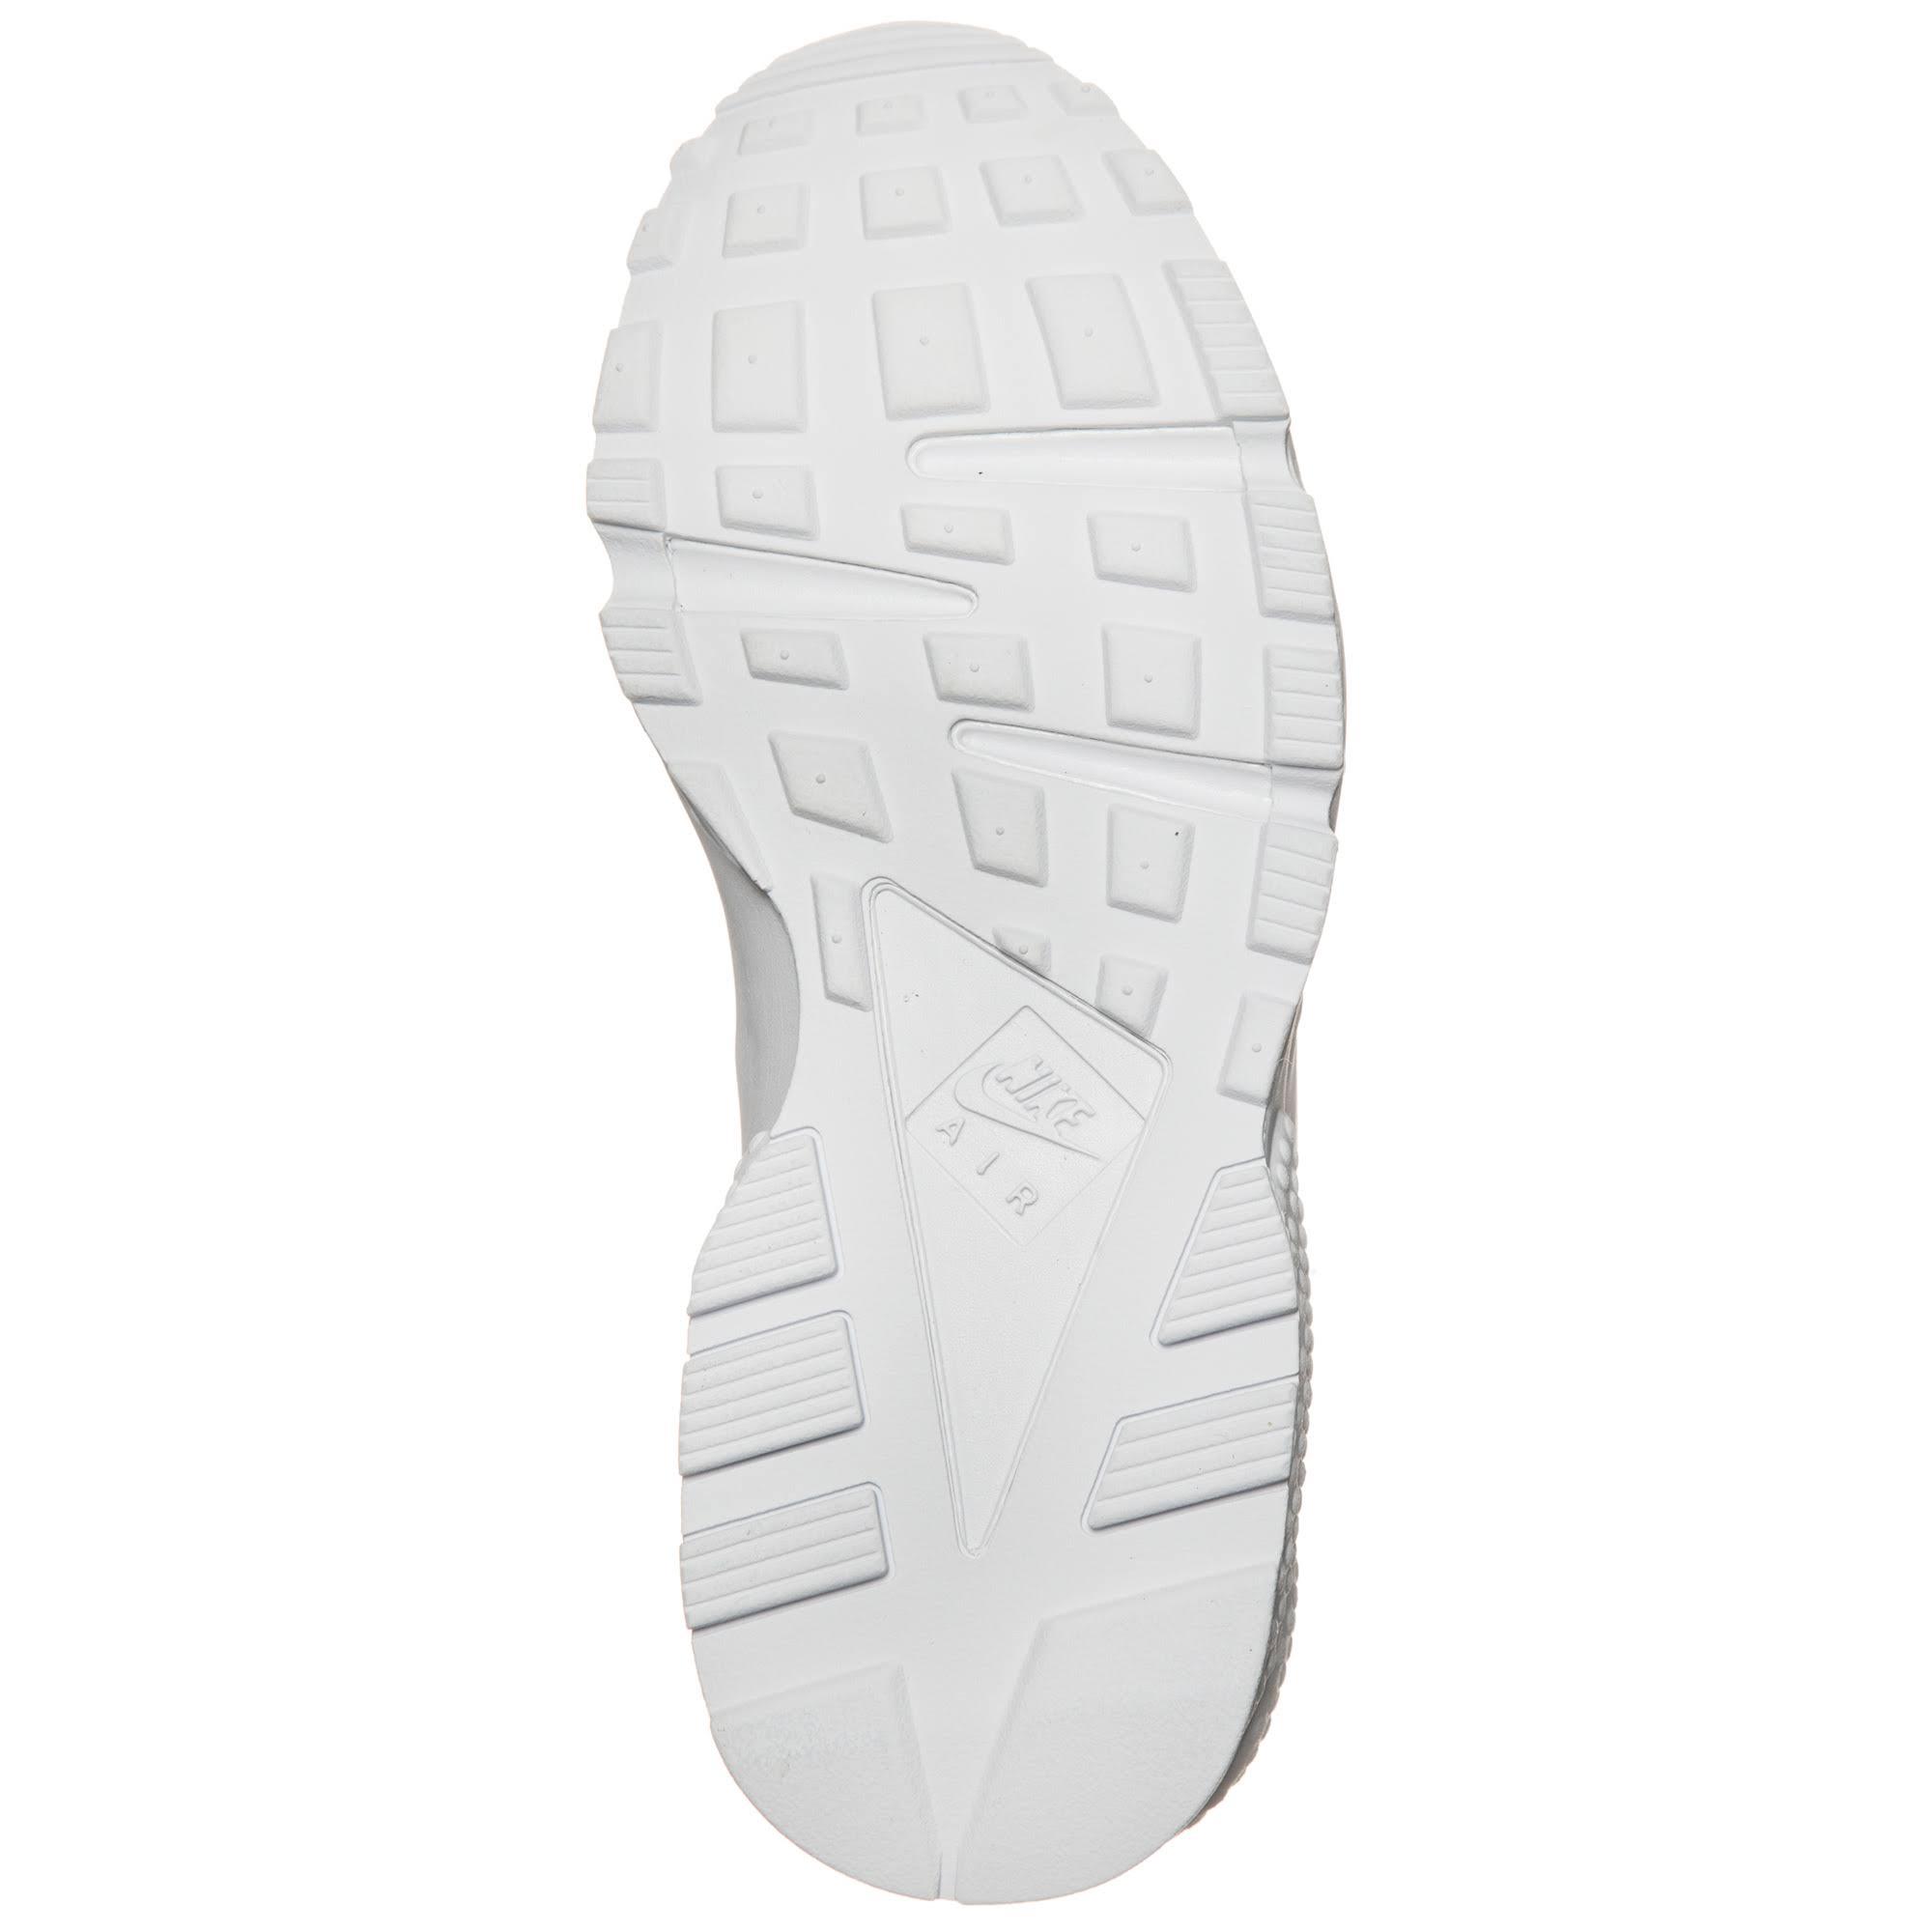 Run Weiss 9 Air 5 Größe Weiß us Nike 41 Huarache Eu 634835108 EpvqxH8Rw